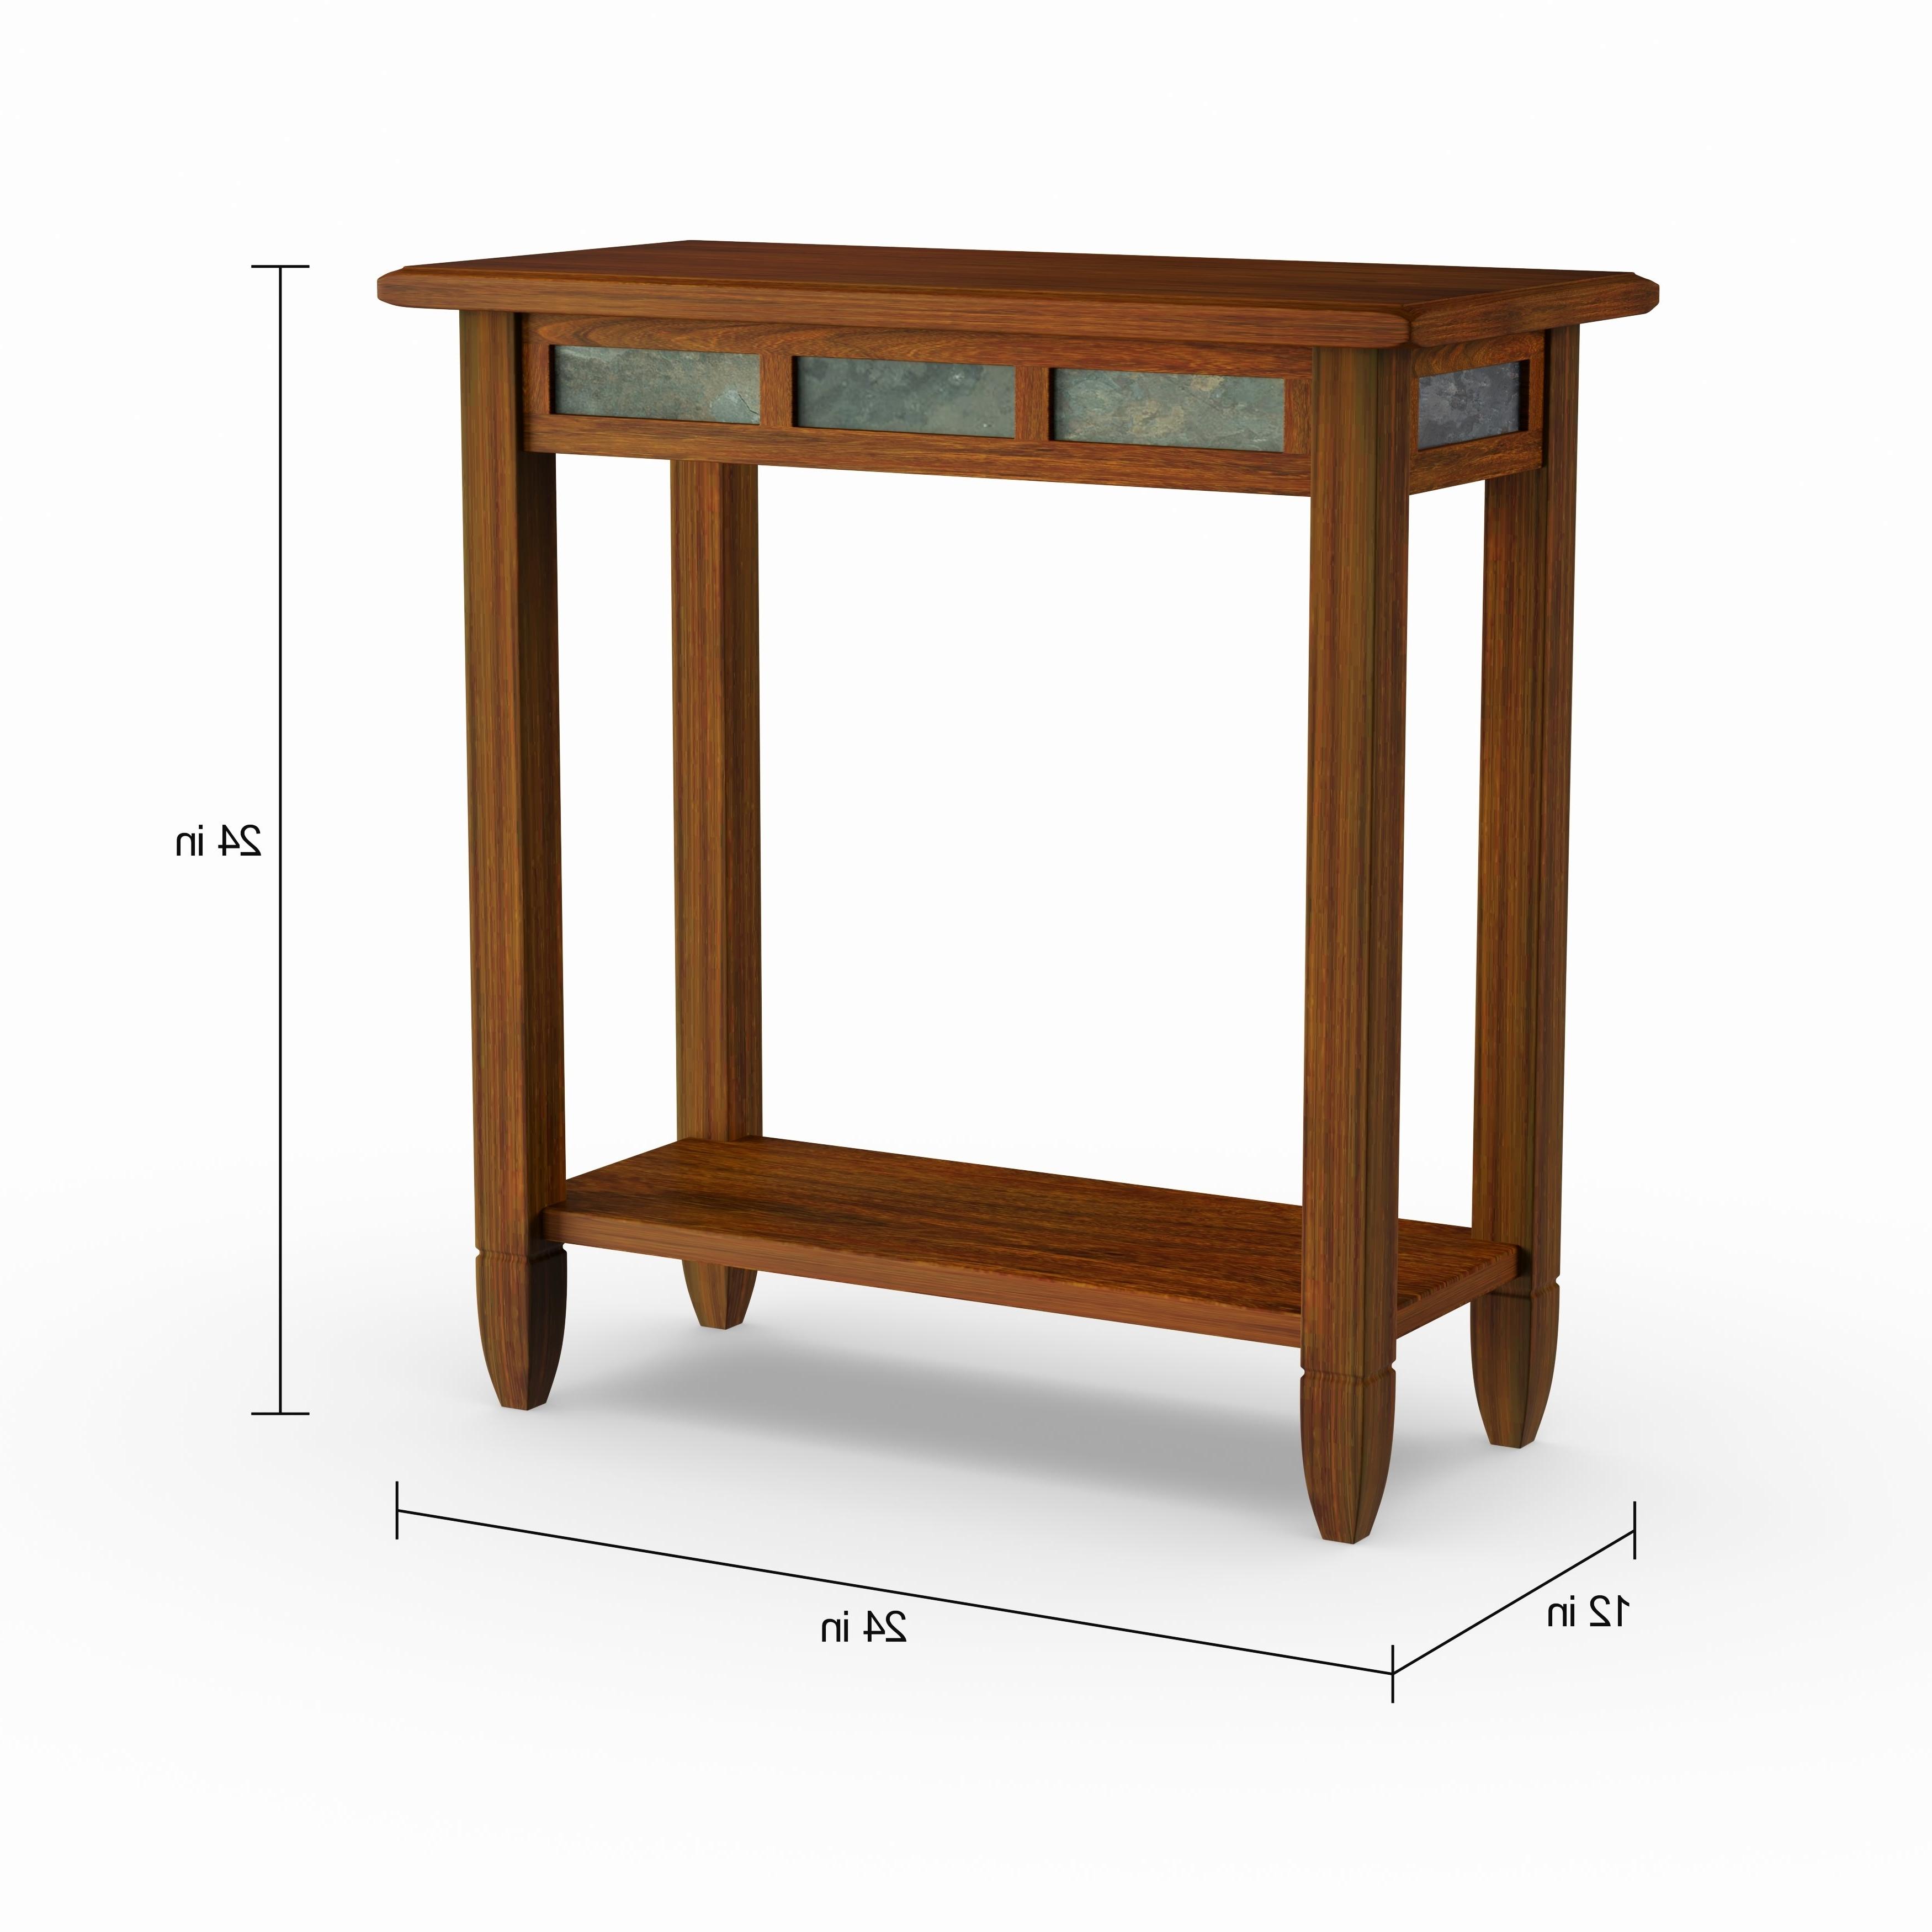 Most Popular Copper Grove Ixia Rustic Oak And Slate Tile Coffee Tables Regarding Copper Grove Ixia Rustic Oak And Slate Tile Chairside Table (View 3 of 20)